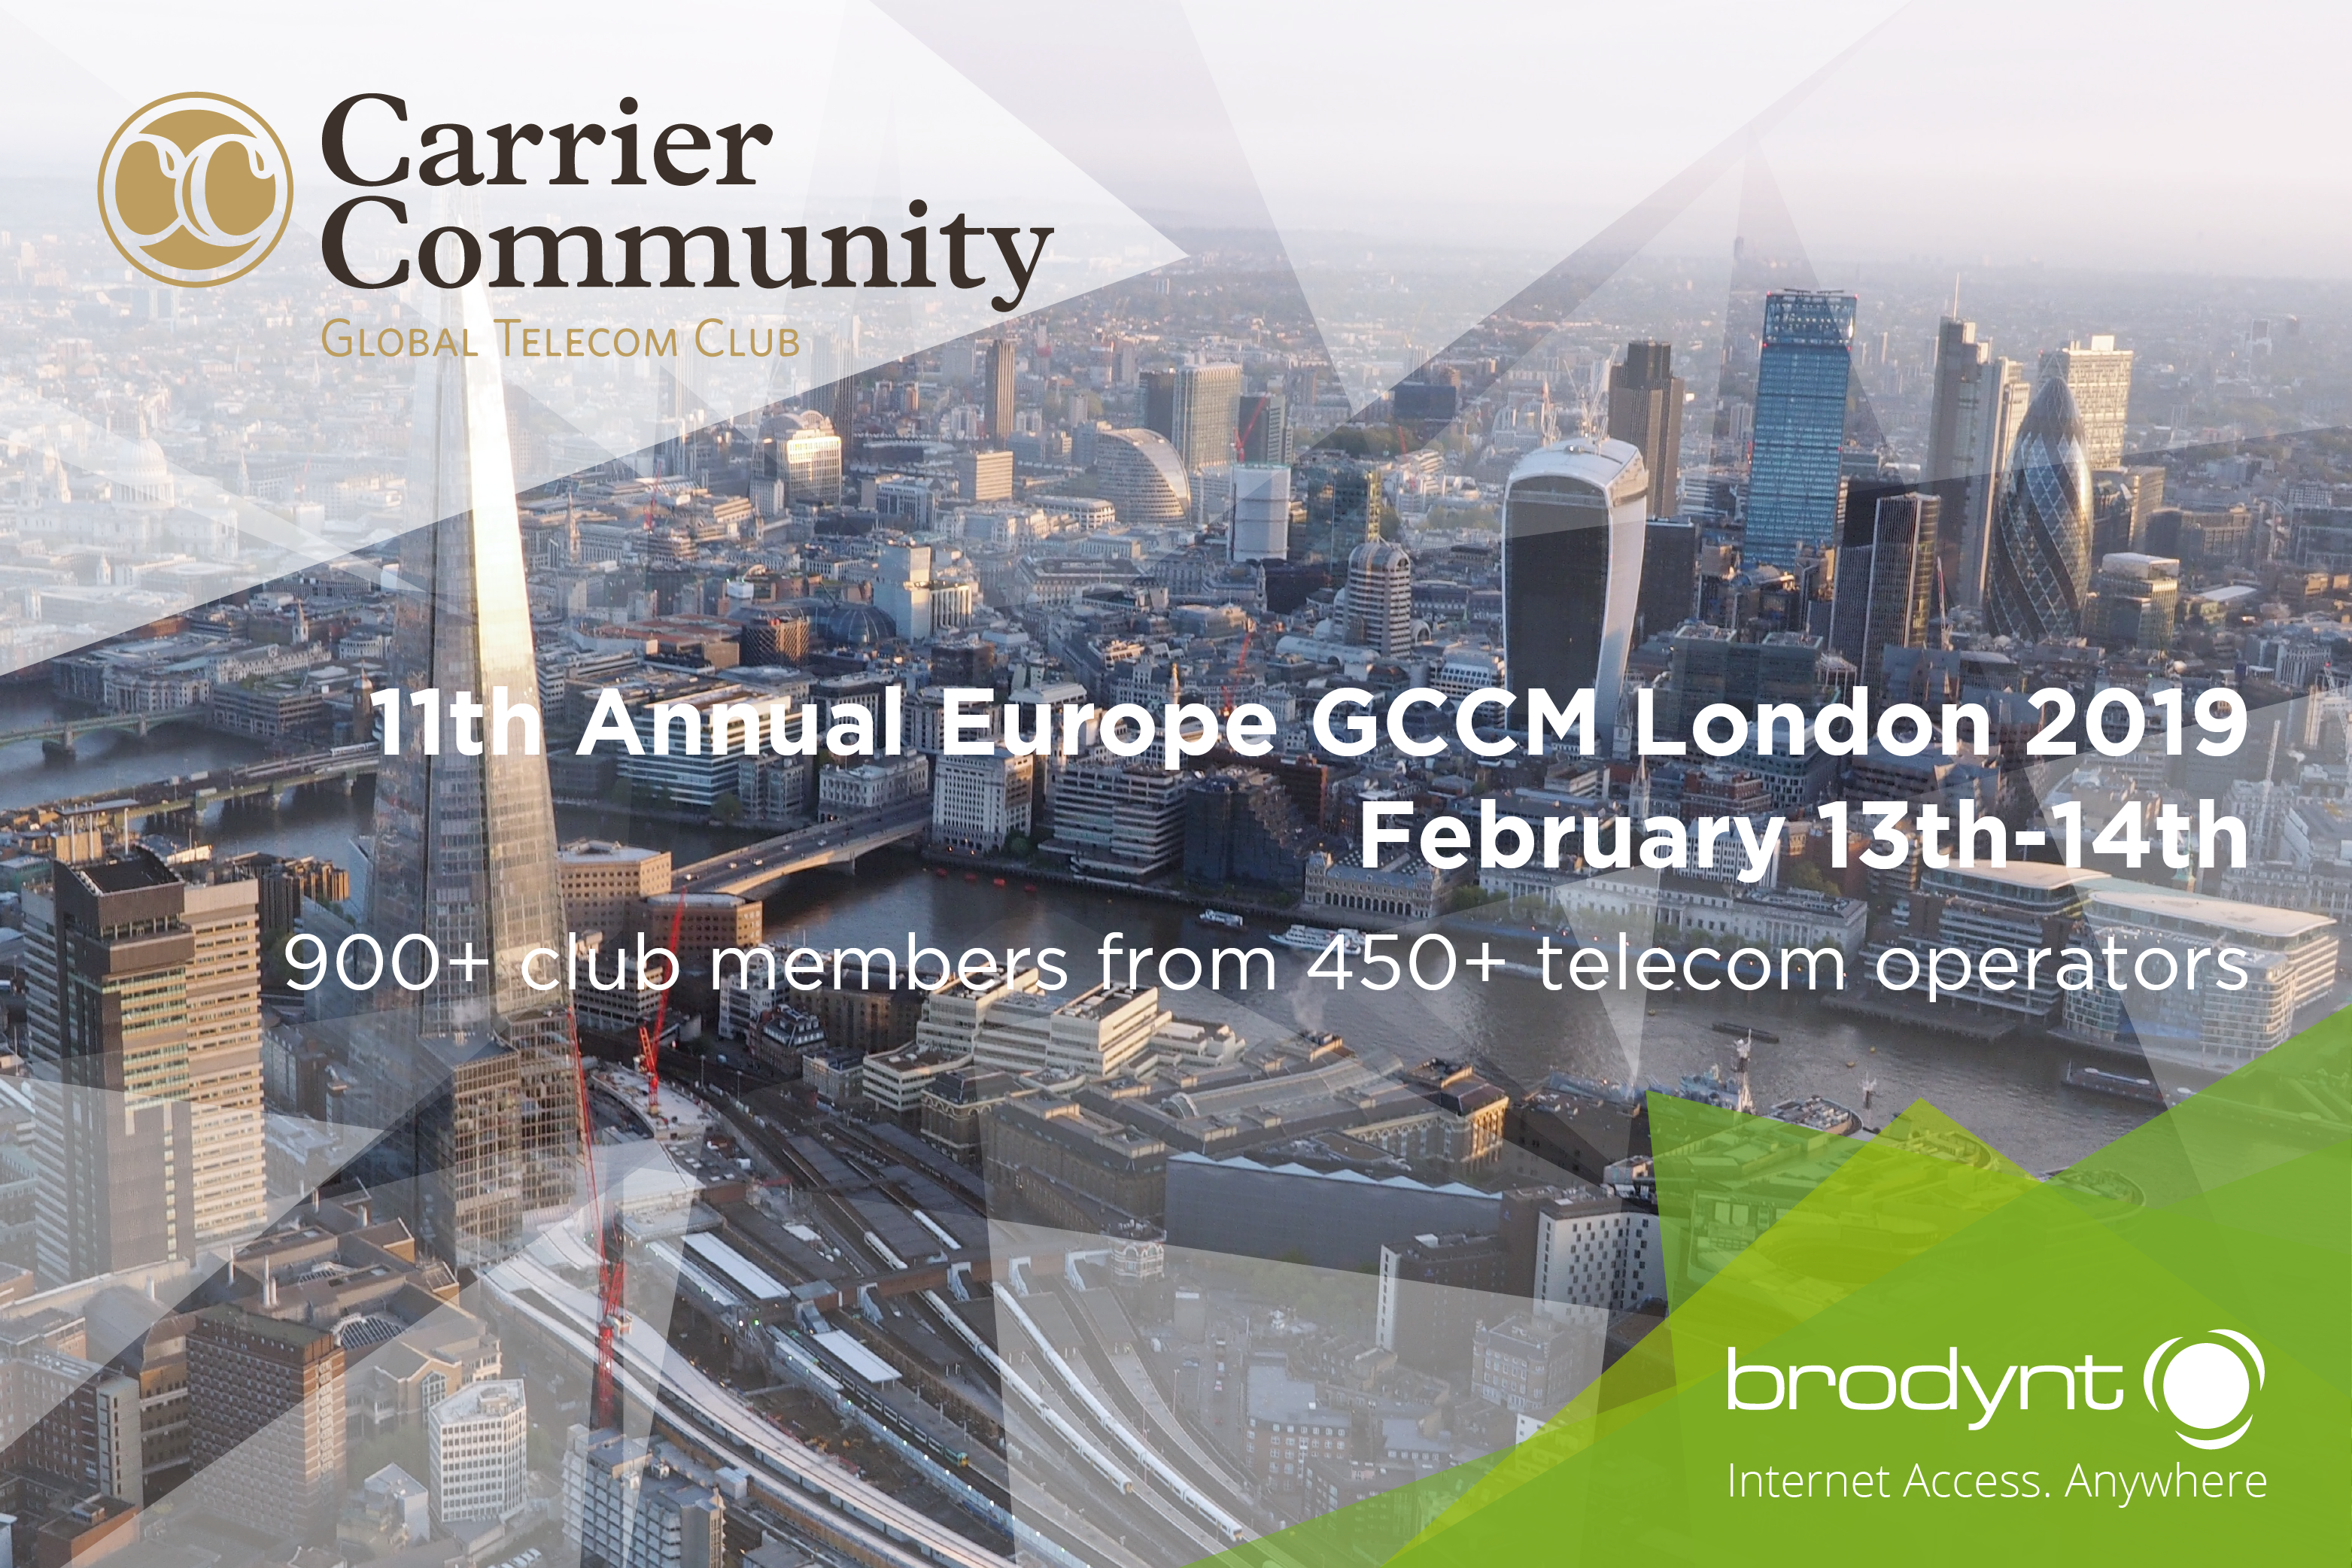 GCMM London 2019